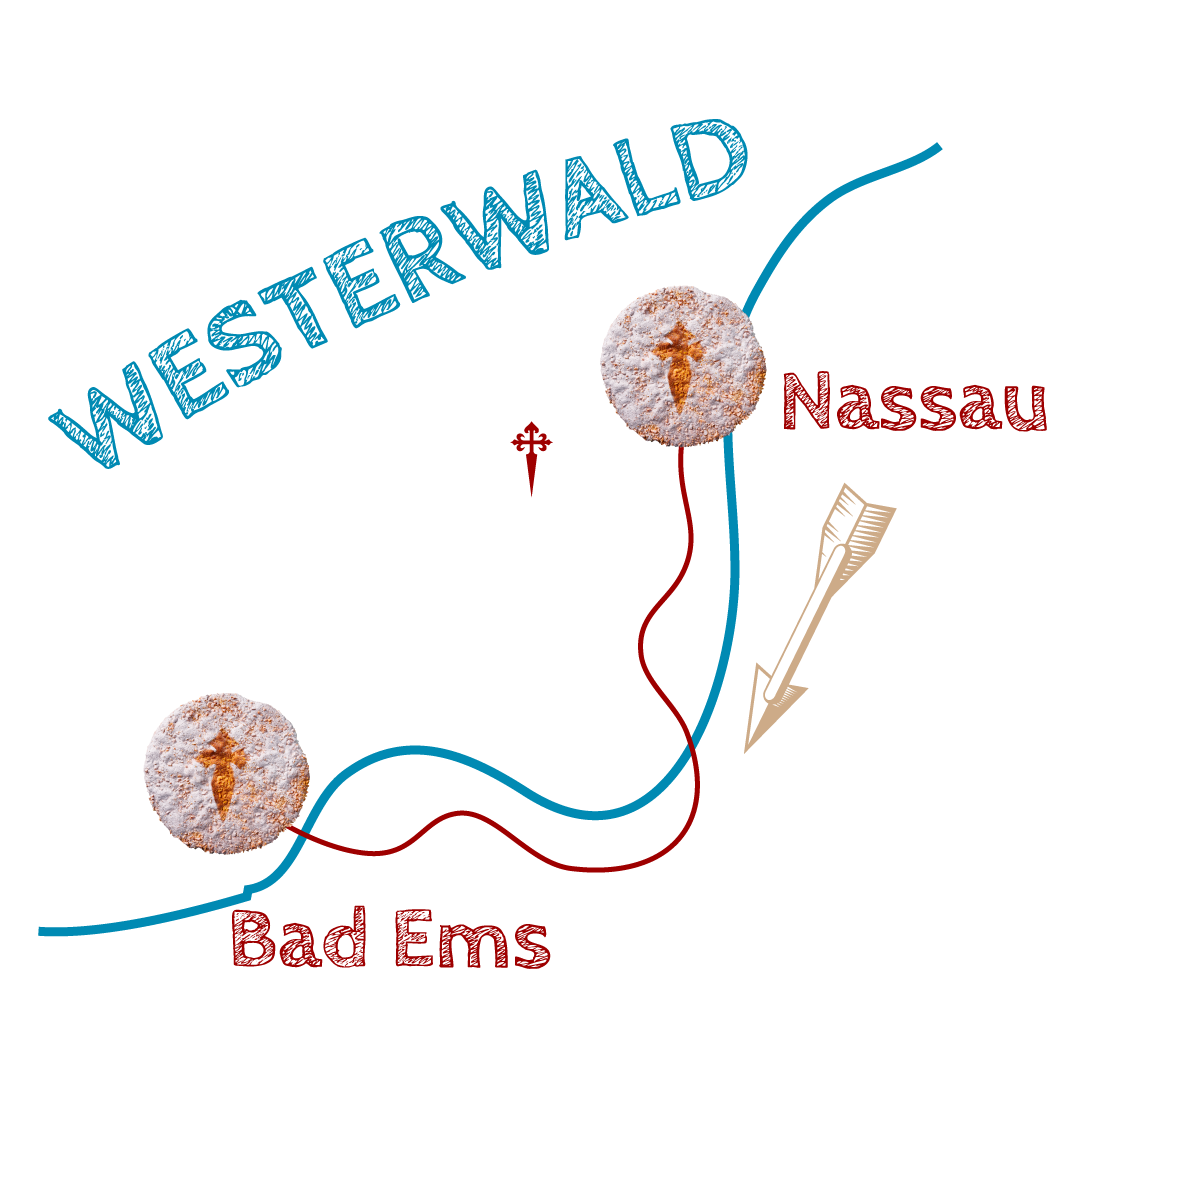 Wegegrafik-Westerwald-Nassau-Bad-Ems